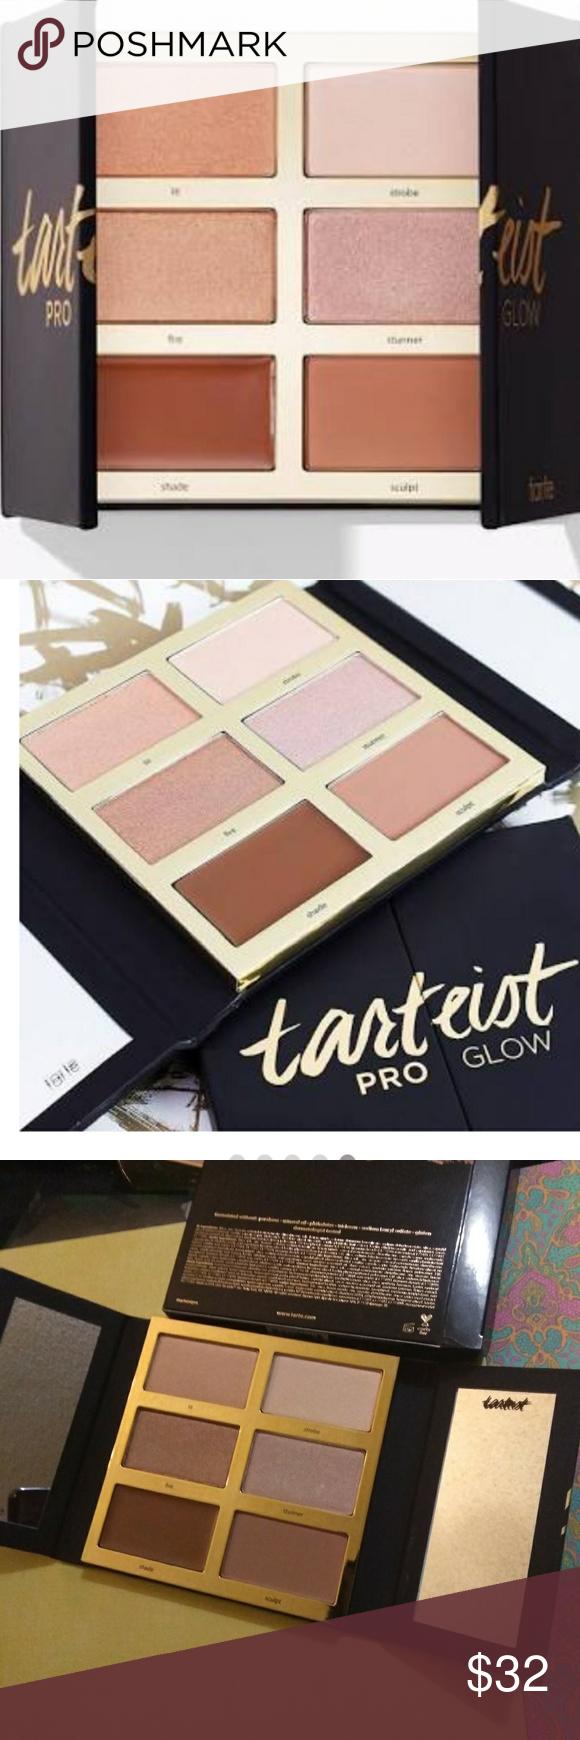 BNIB💣 Tarteist PRO GLOW NWT (With images) Makeup